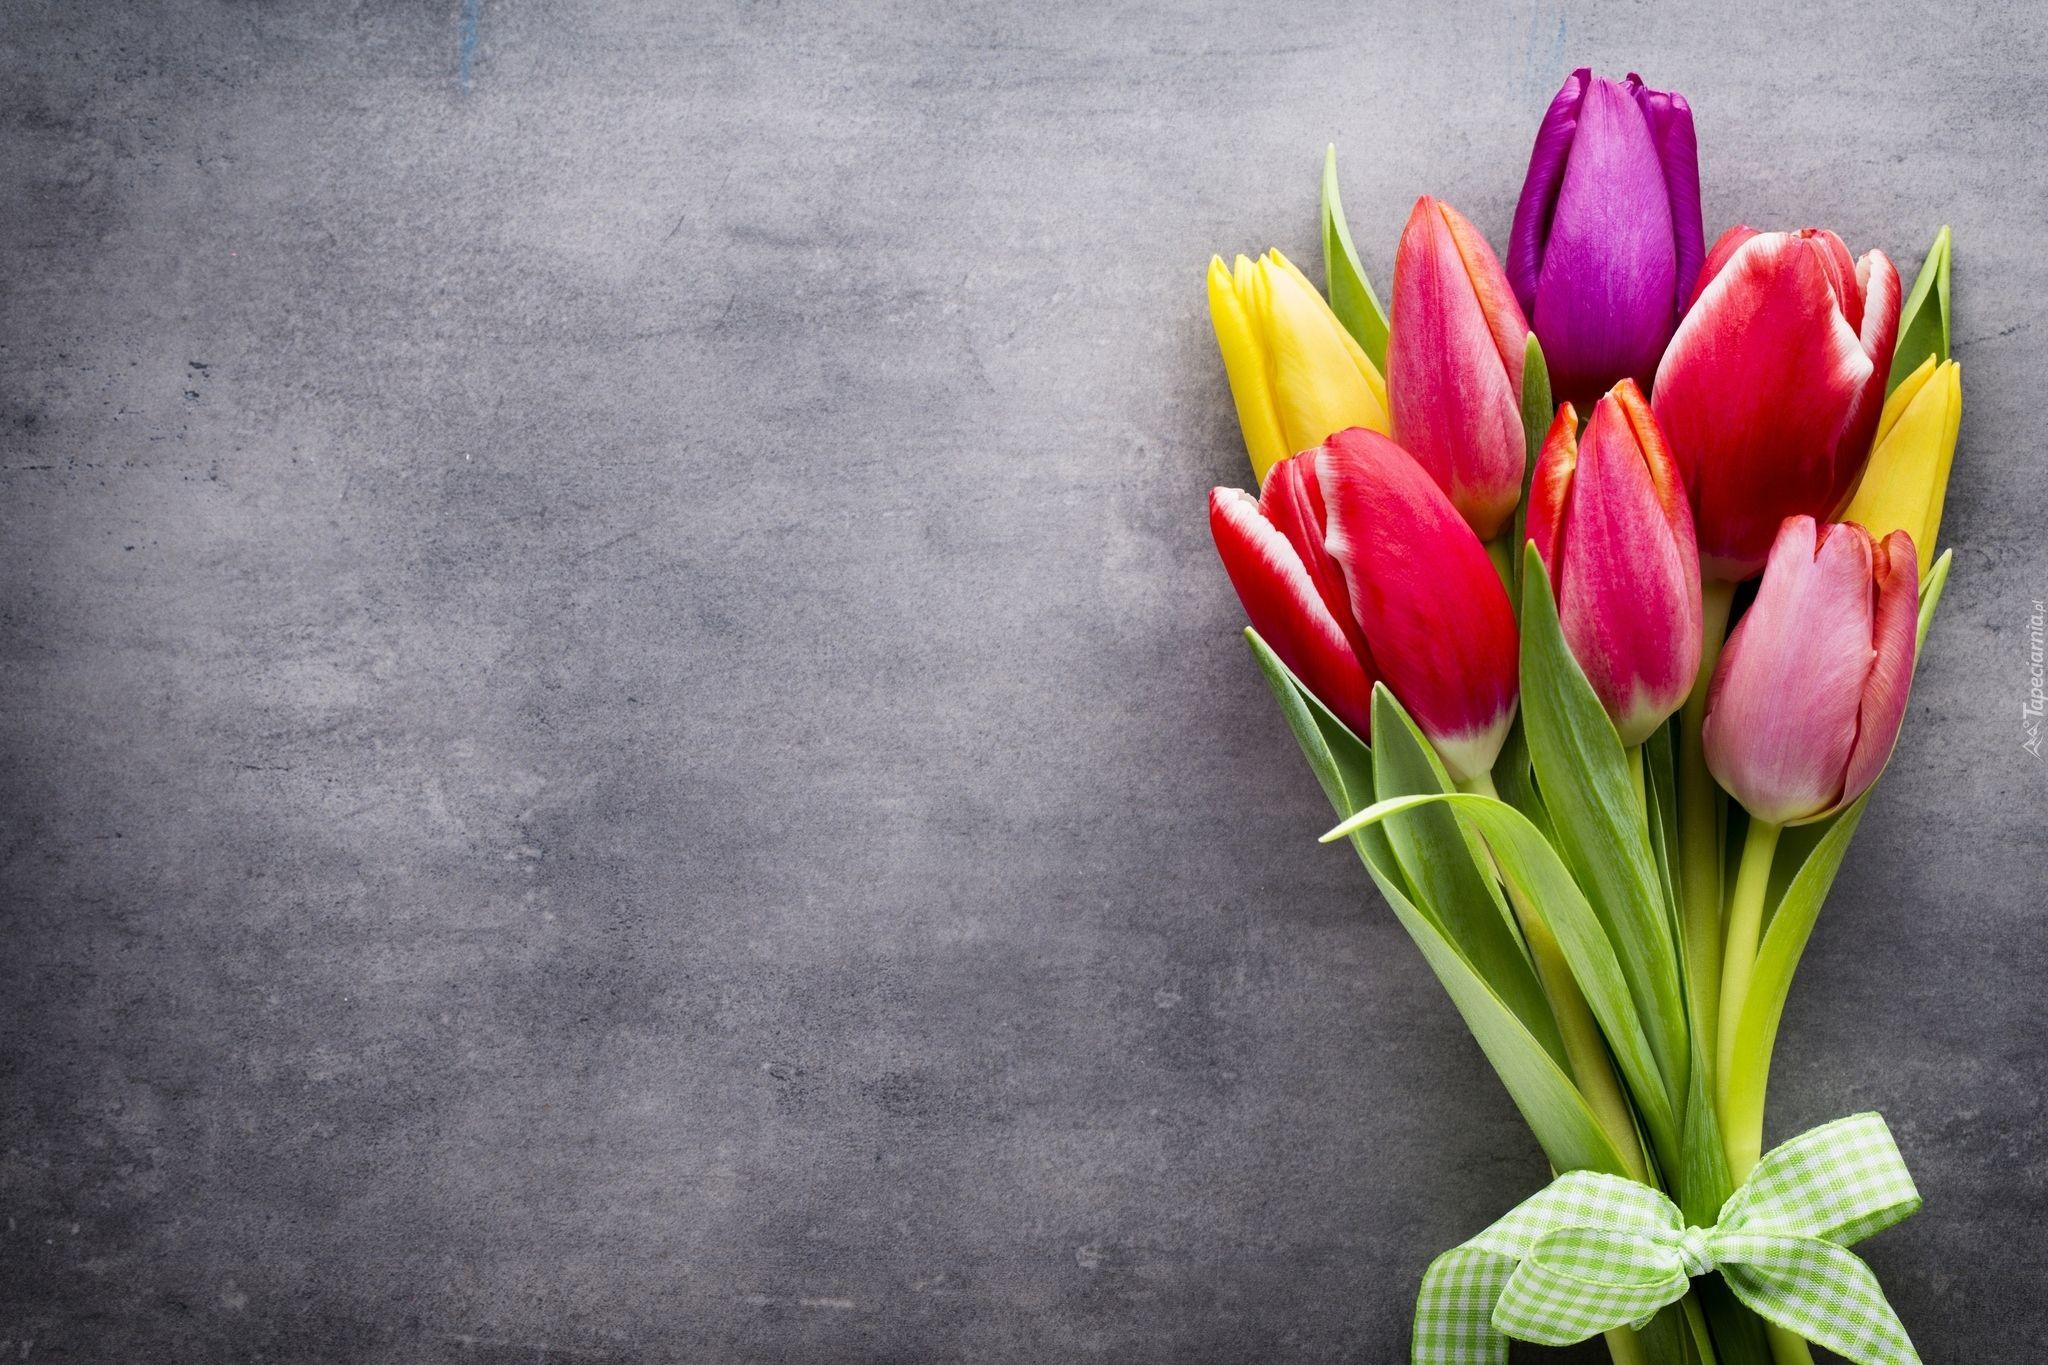 Kolorowy Bukiet Tulipany Beautiful Flowers Wallpapers Floral Poster Flower Backgrounds